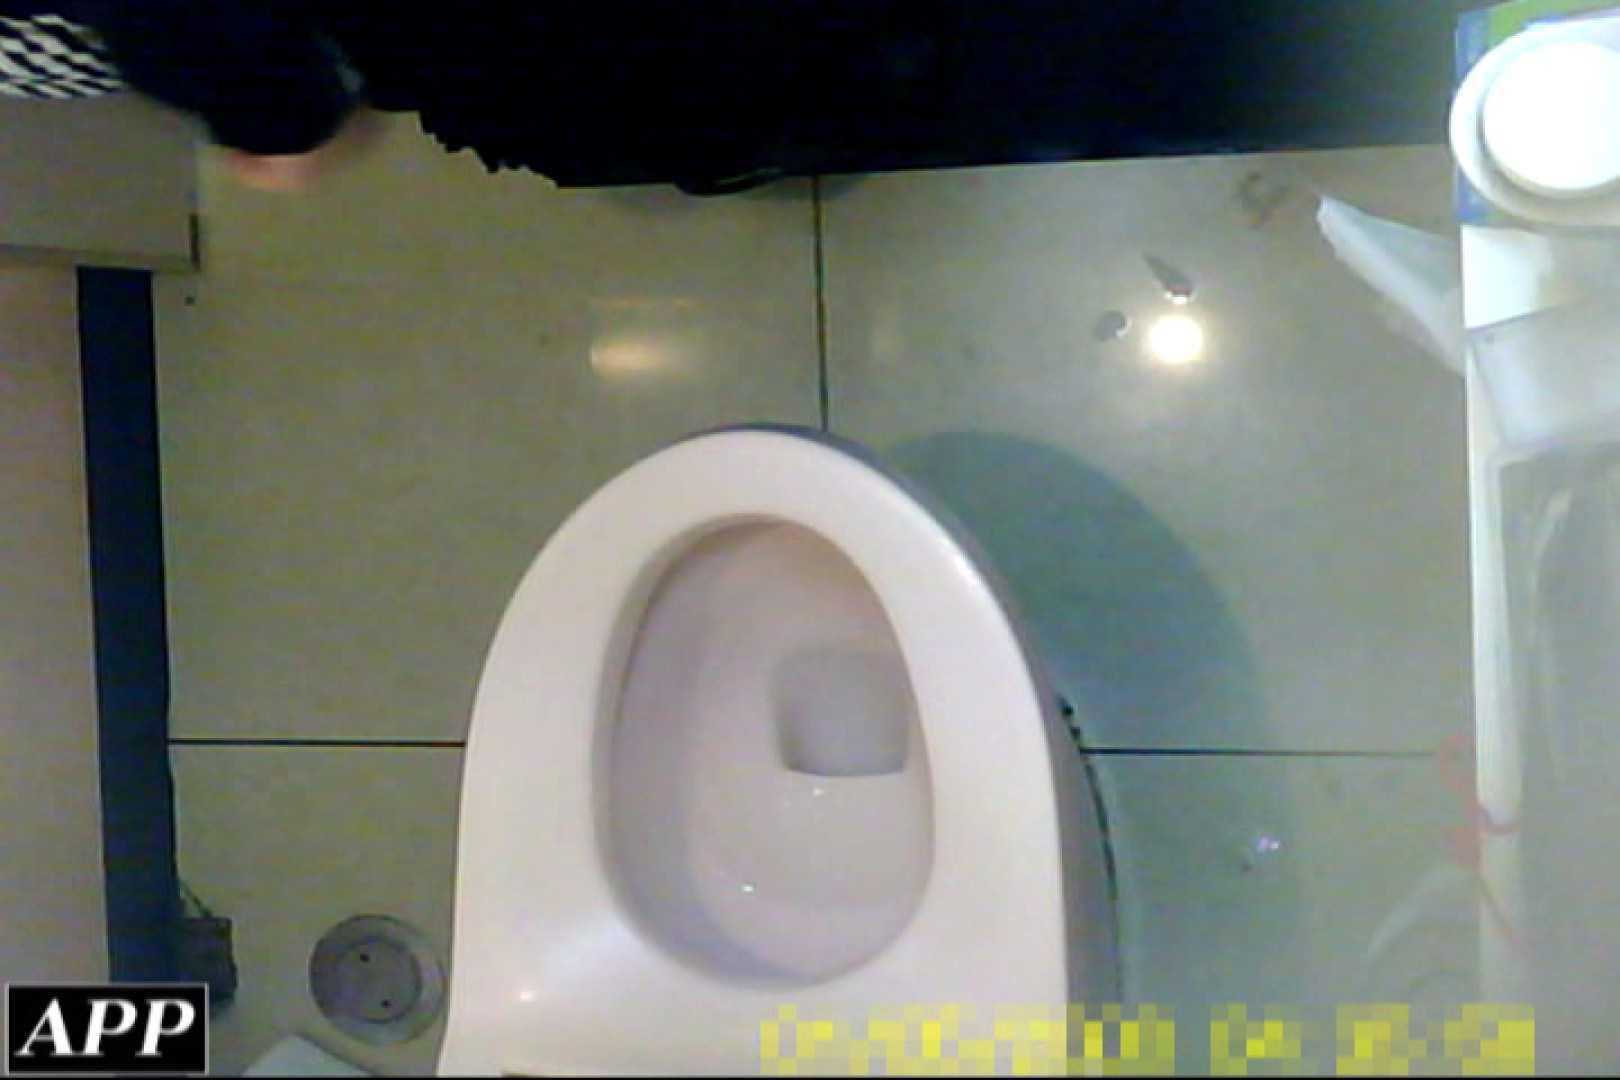 3視点洗面所 vol.092 洗面所 | OLセックス  101画像 15